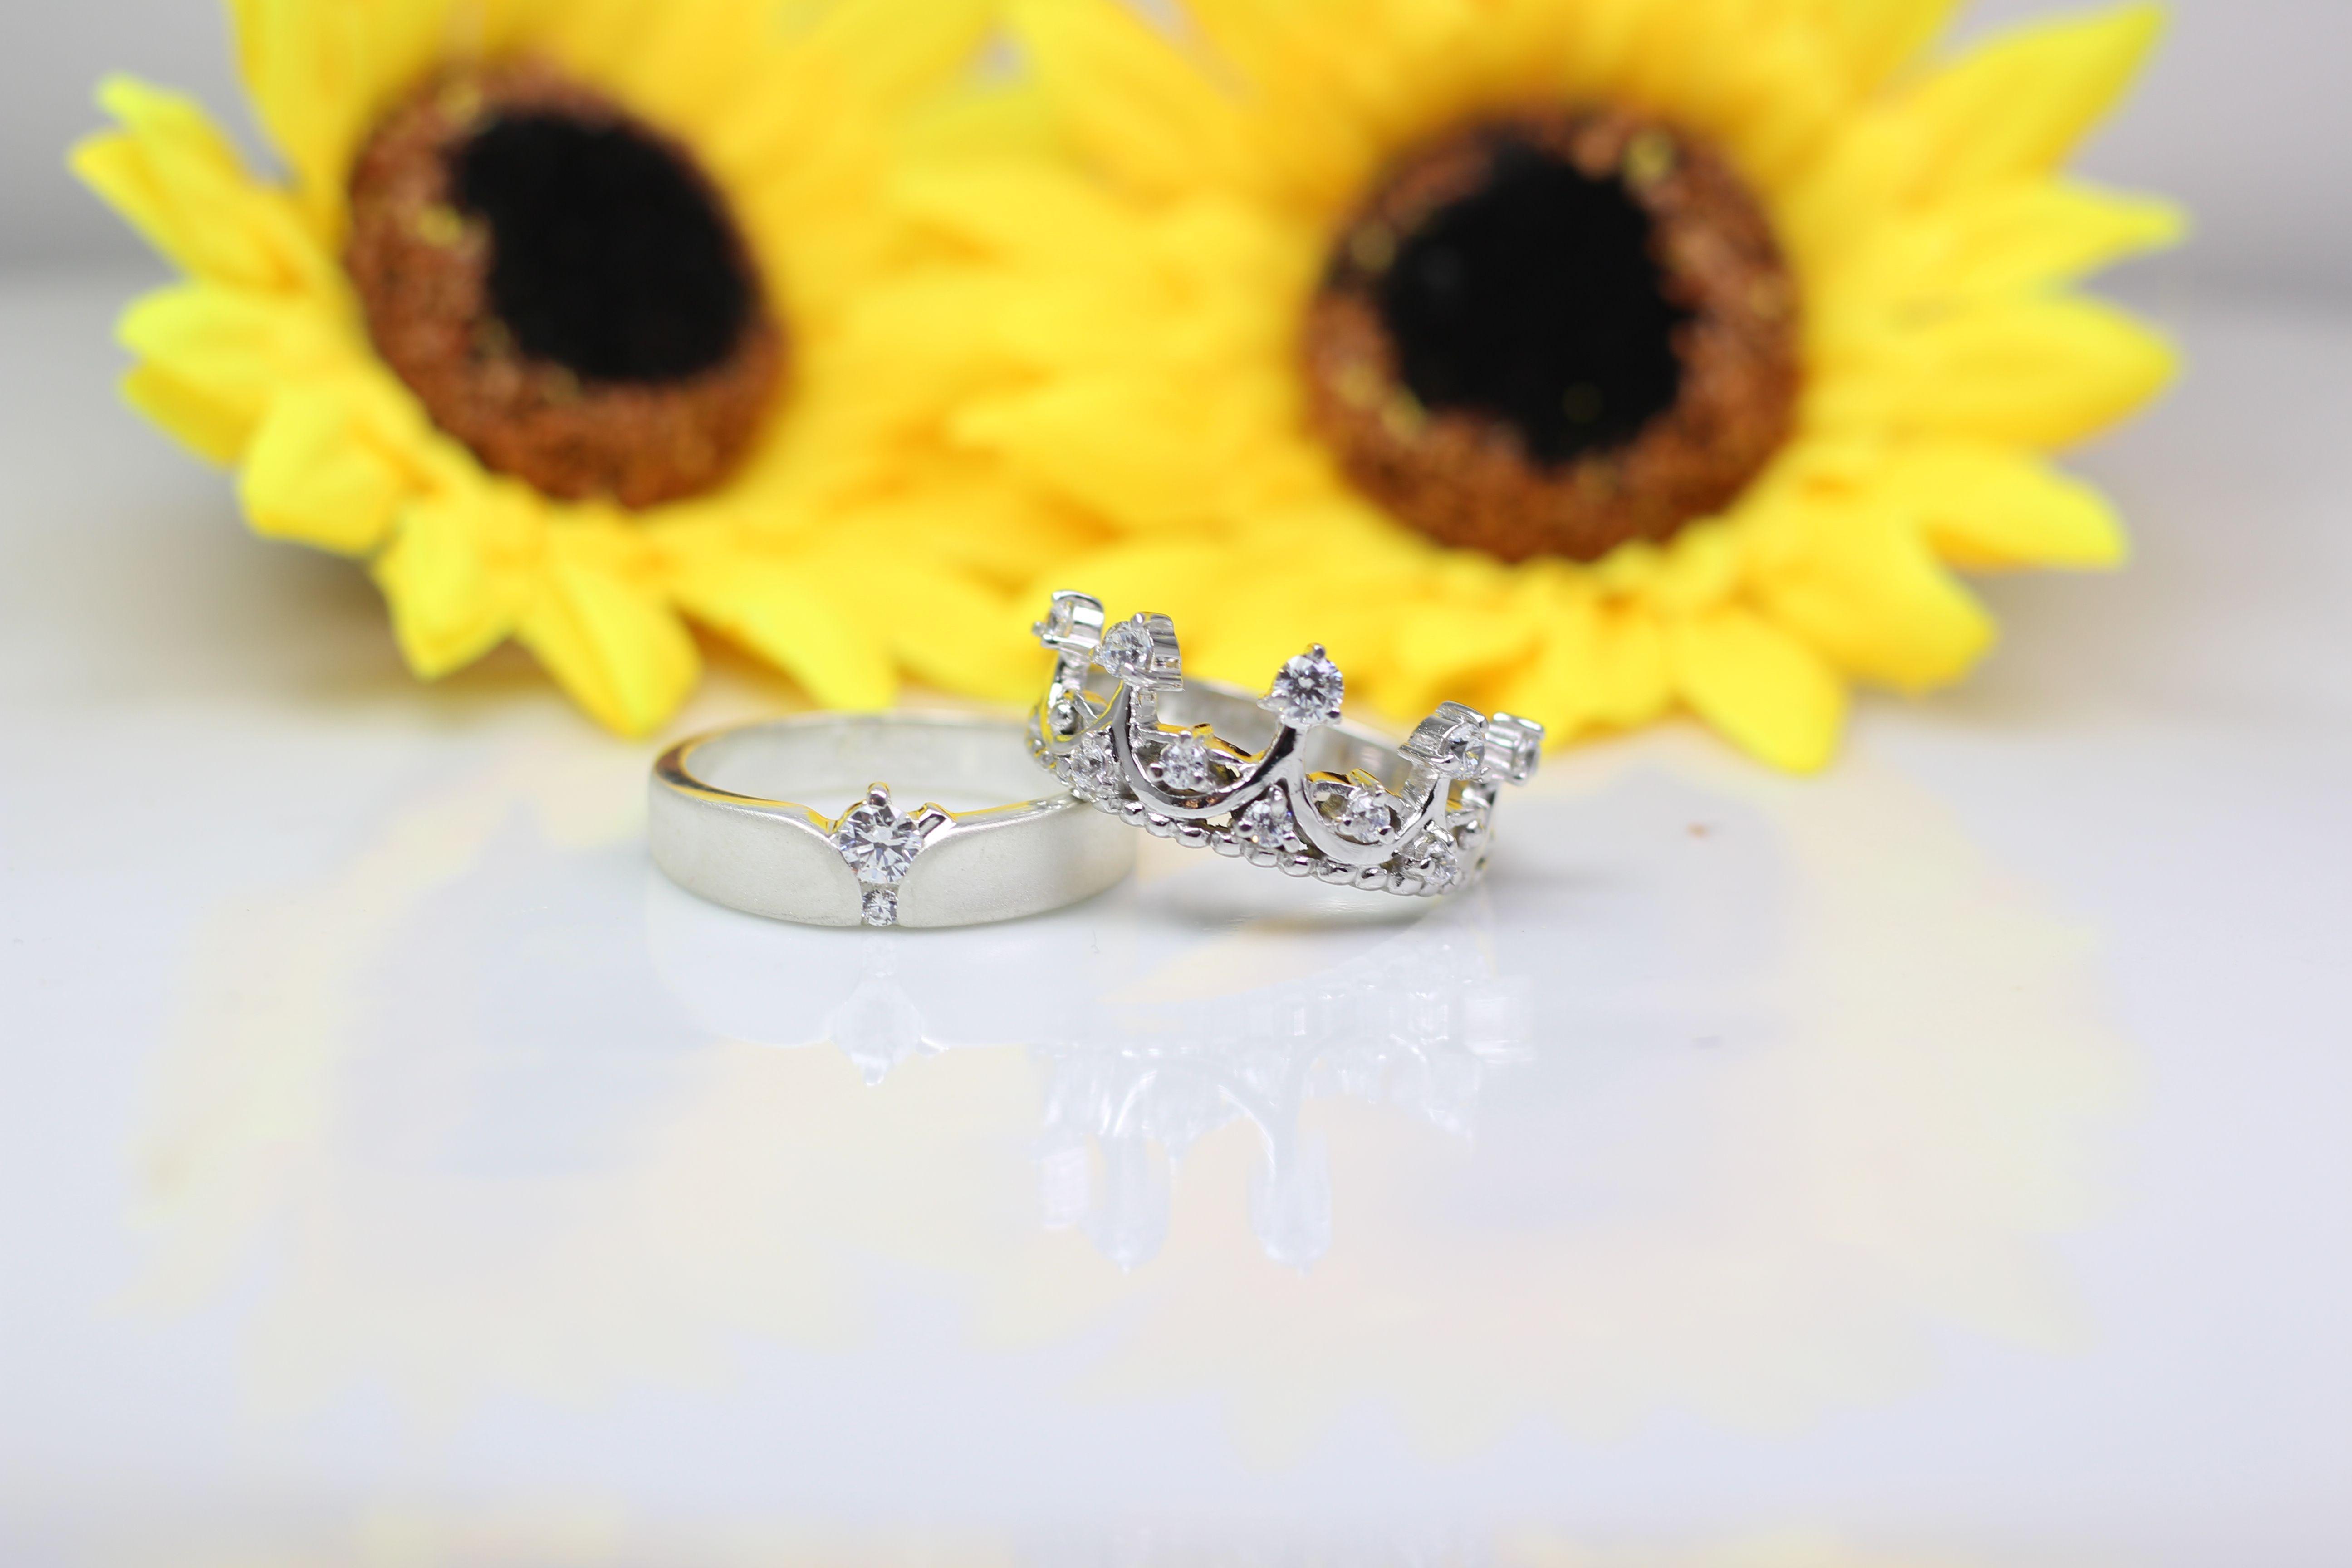 Cincin Kawin Tunangan Model Simpel Dan Elegan Kotagede Jewellery Adalah Solusi Bagi Anda Yang Sedang Mencari Cincin Kawi Cincin Kawin Cincin Cincin Tunangan